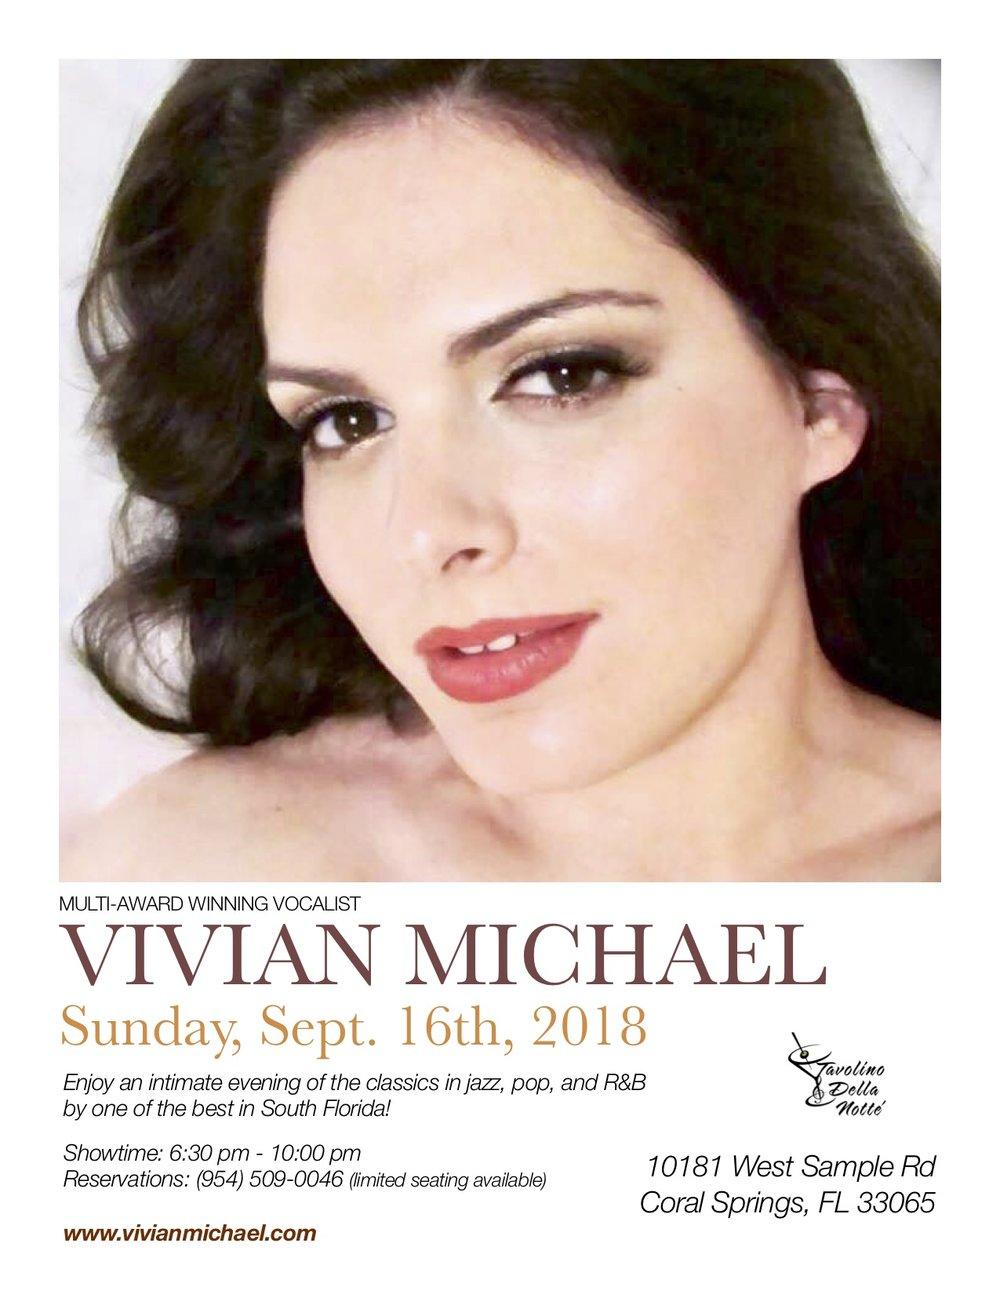 Vivian Michael @ Tavolino Della Notté.jpg